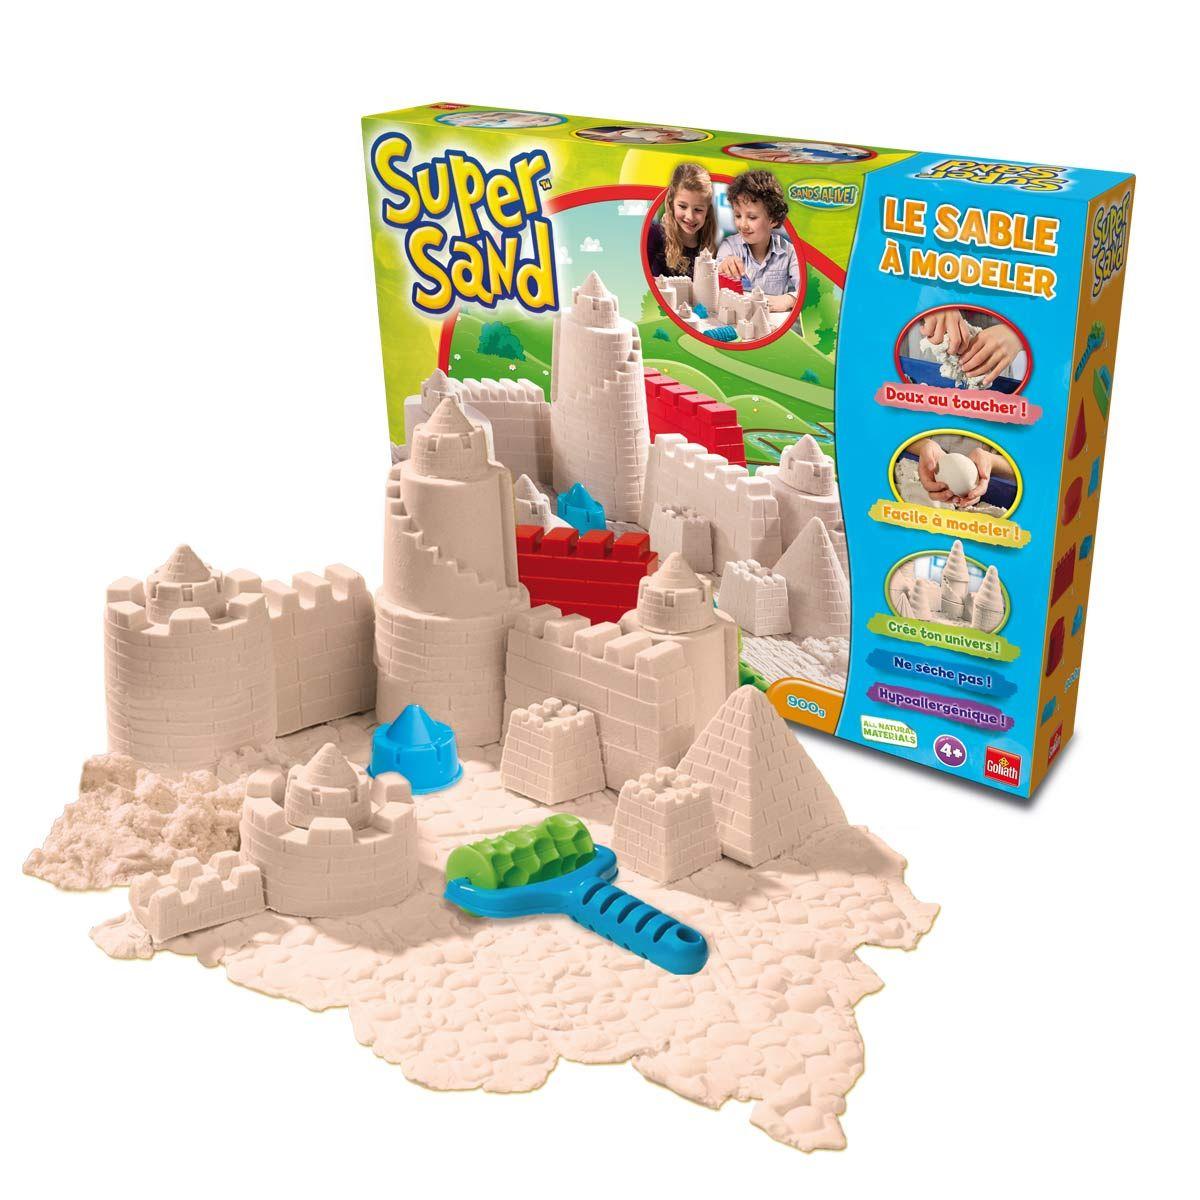 avec ce sable modeler naturel et hypoallerg nique votre enfant pourra cr er un v ritable. Black Bedroom Furniture Sets. Home Design Ideas